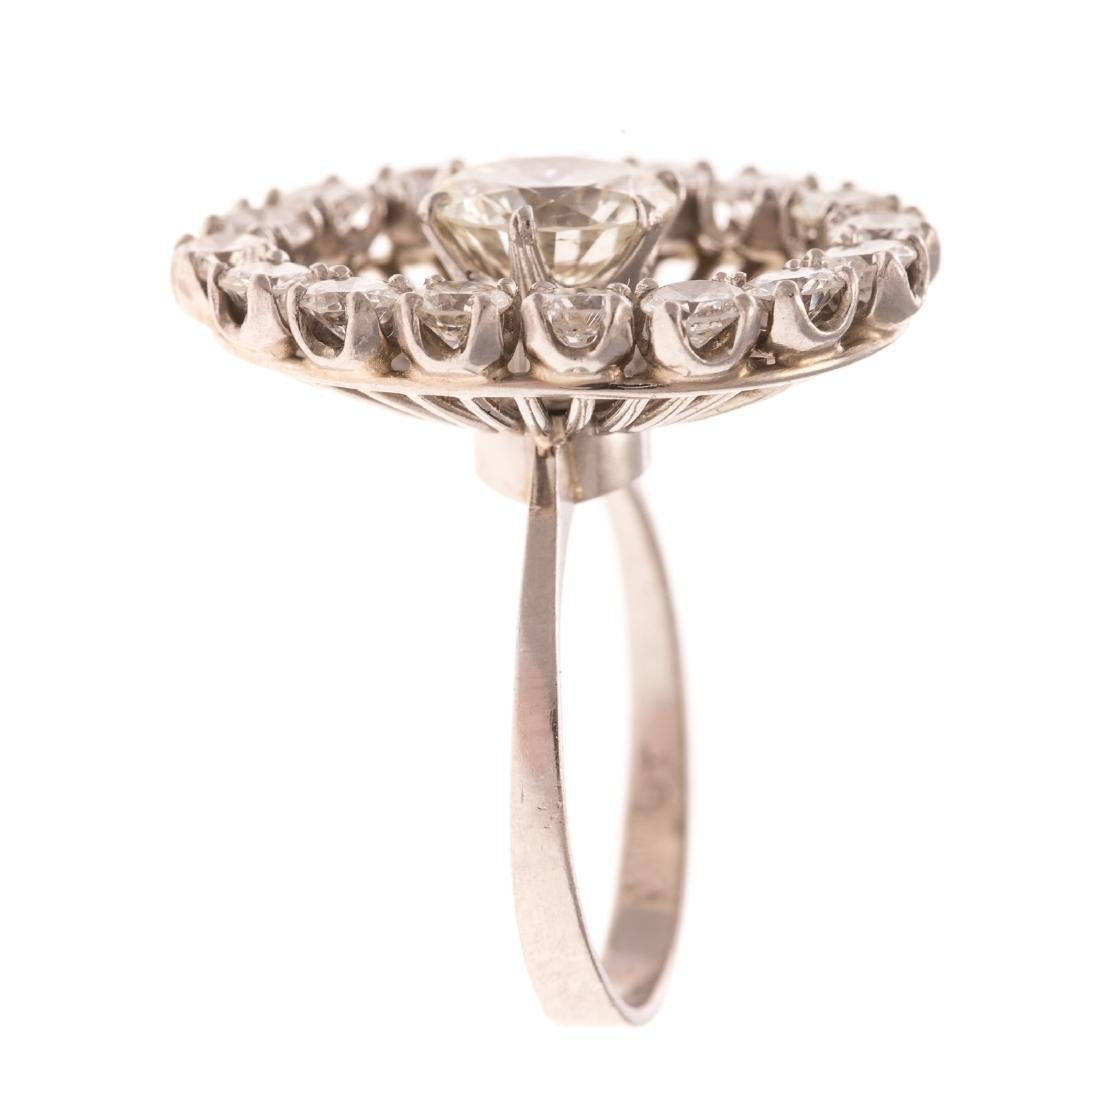 A Lady's Platinum Diamond Cocktail Ring - 2